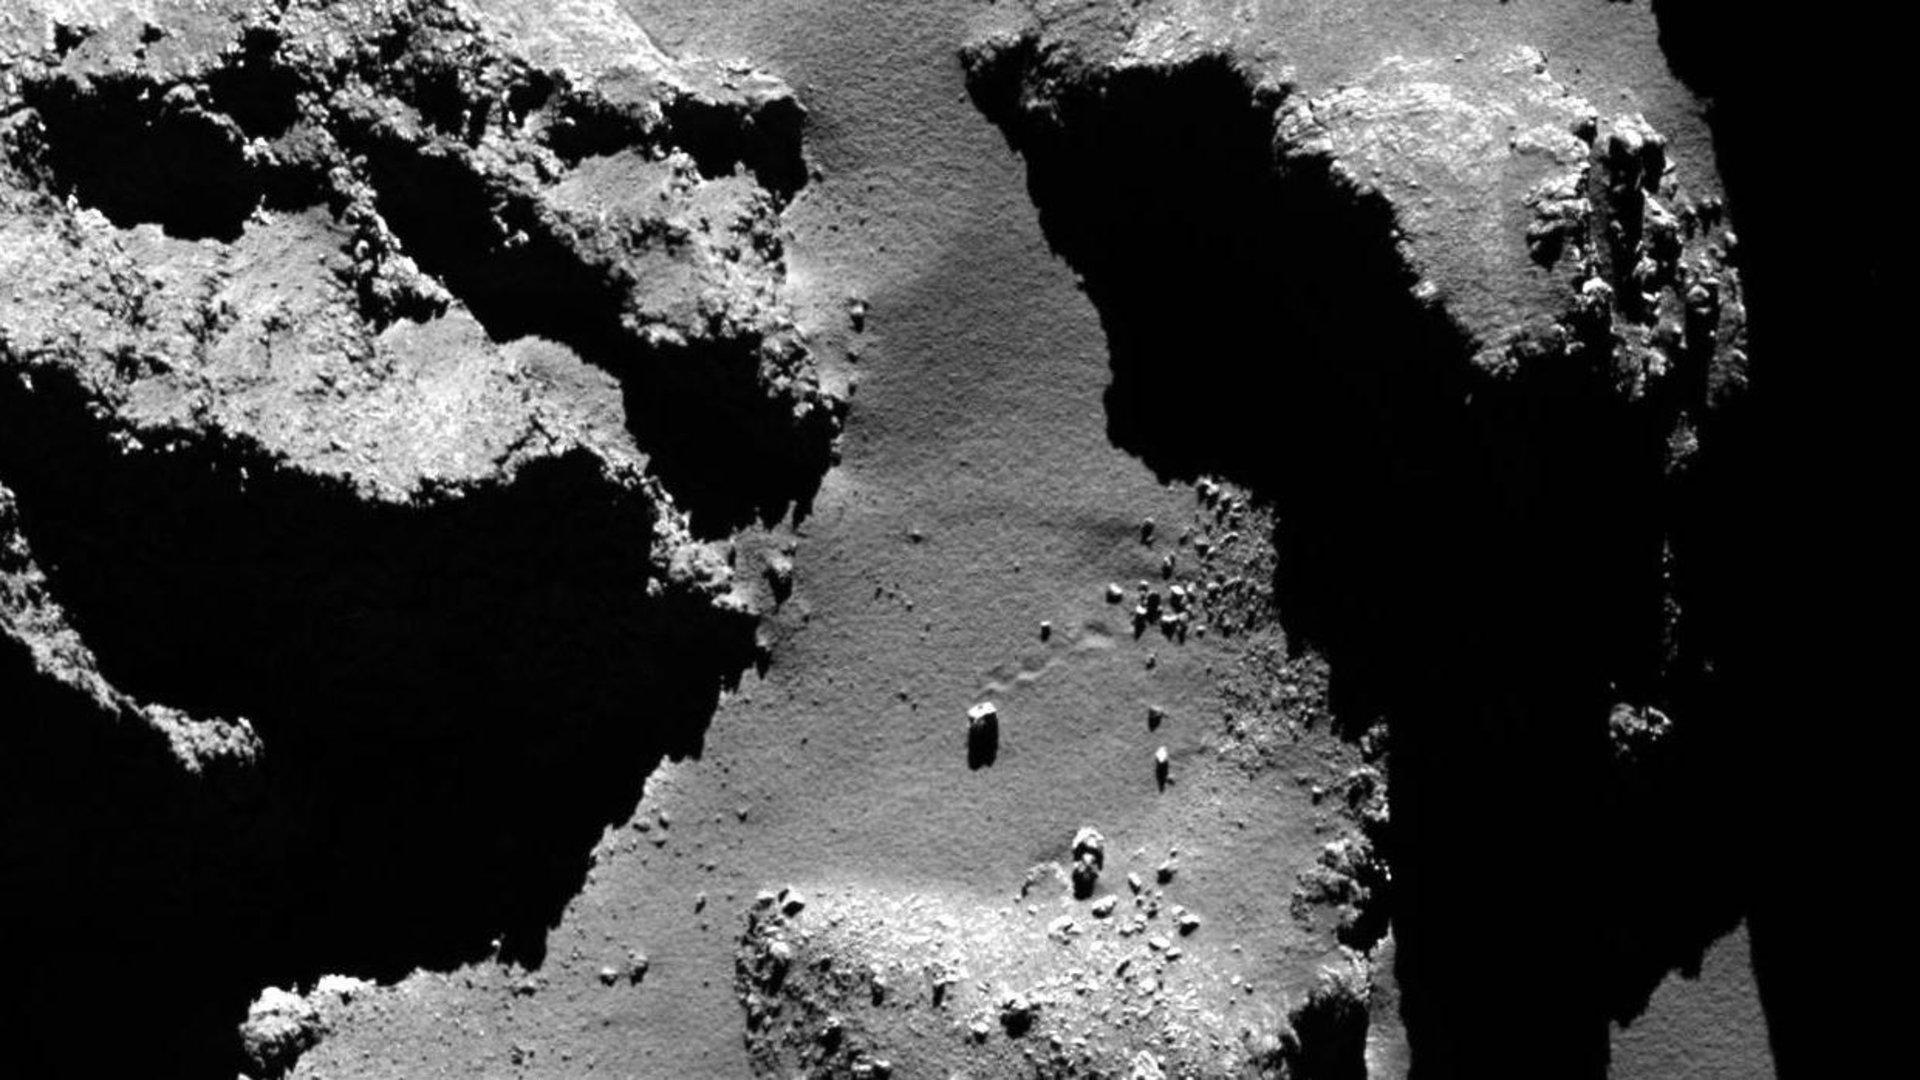 Rosetta probe spots bouncing boulders on Comet 67P